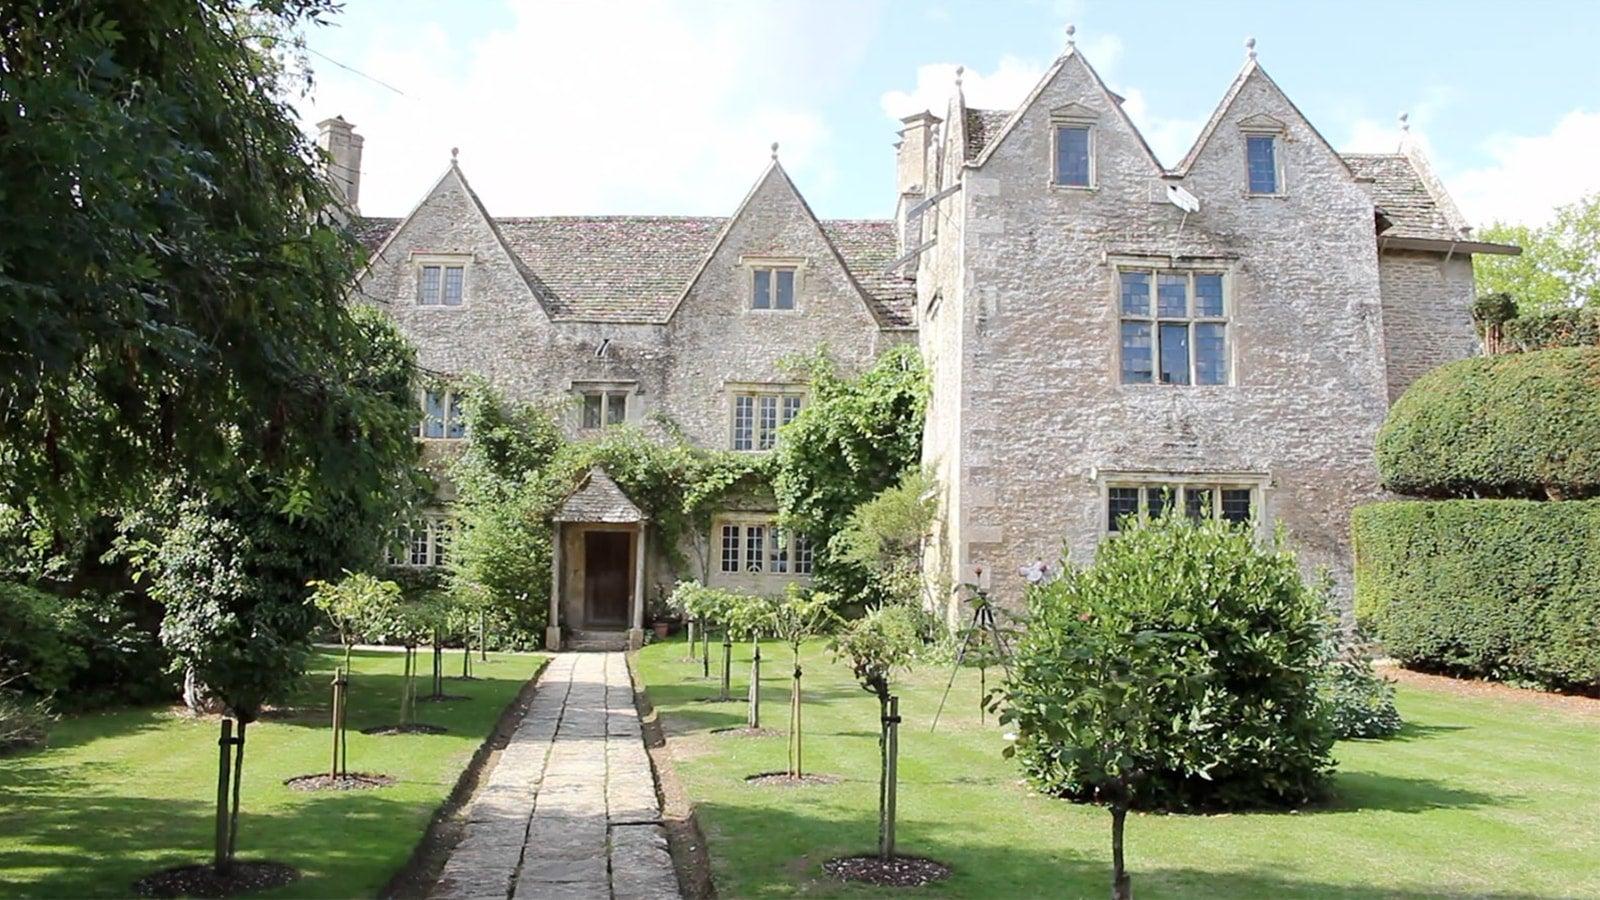 Kelmscott Manor, Cotswolds, William Morris' former home